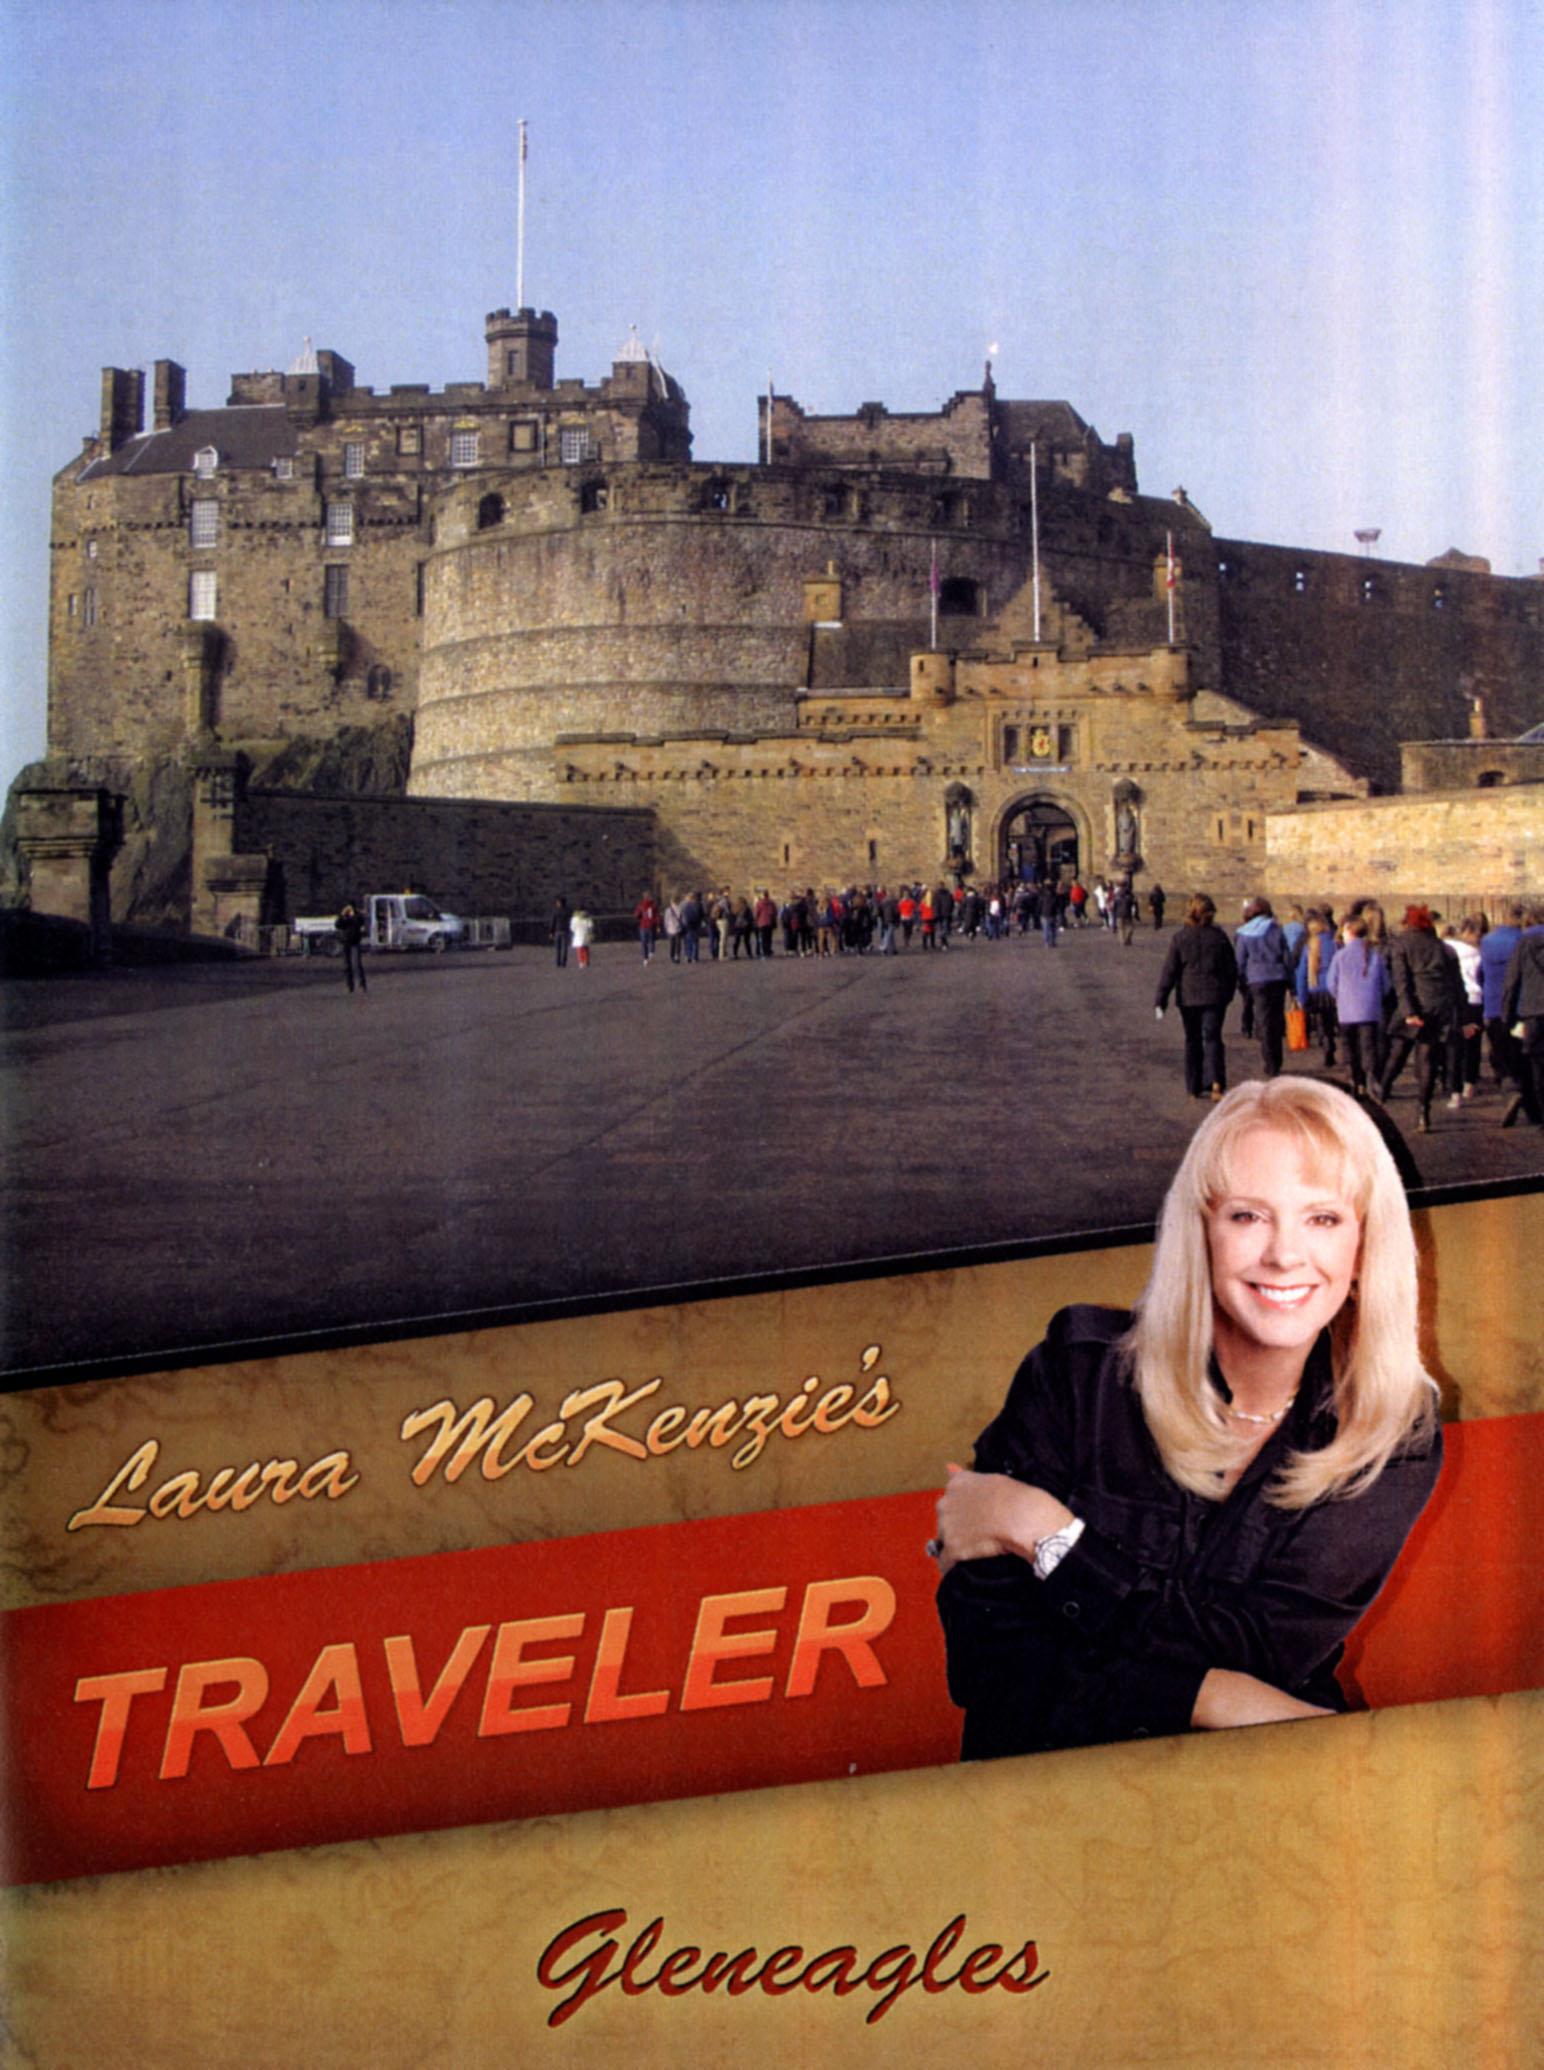 Laura McKenzie's Traveler: Gleneagles